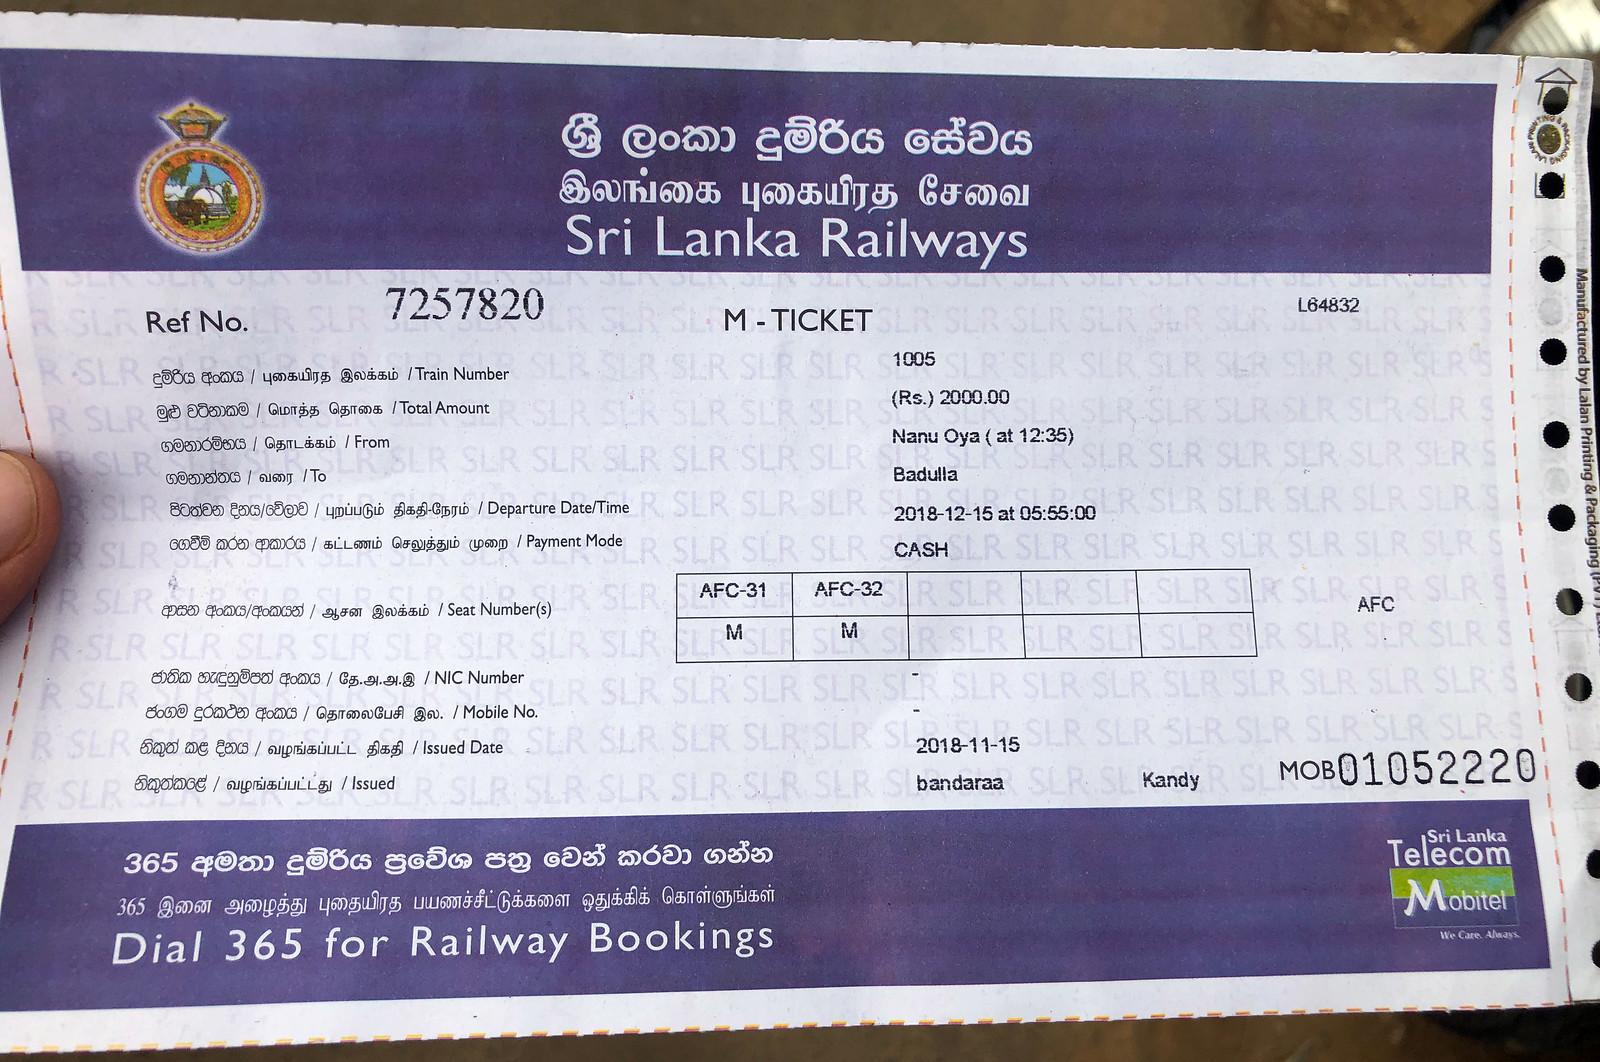 Tren de Ella, Ella Railway - Sri Lanka tren de ella - 31954634197 20491a7b0e h - Tren de Ella en Sri Lanka: ¿El viaje en tren más pintoresco del mundo?